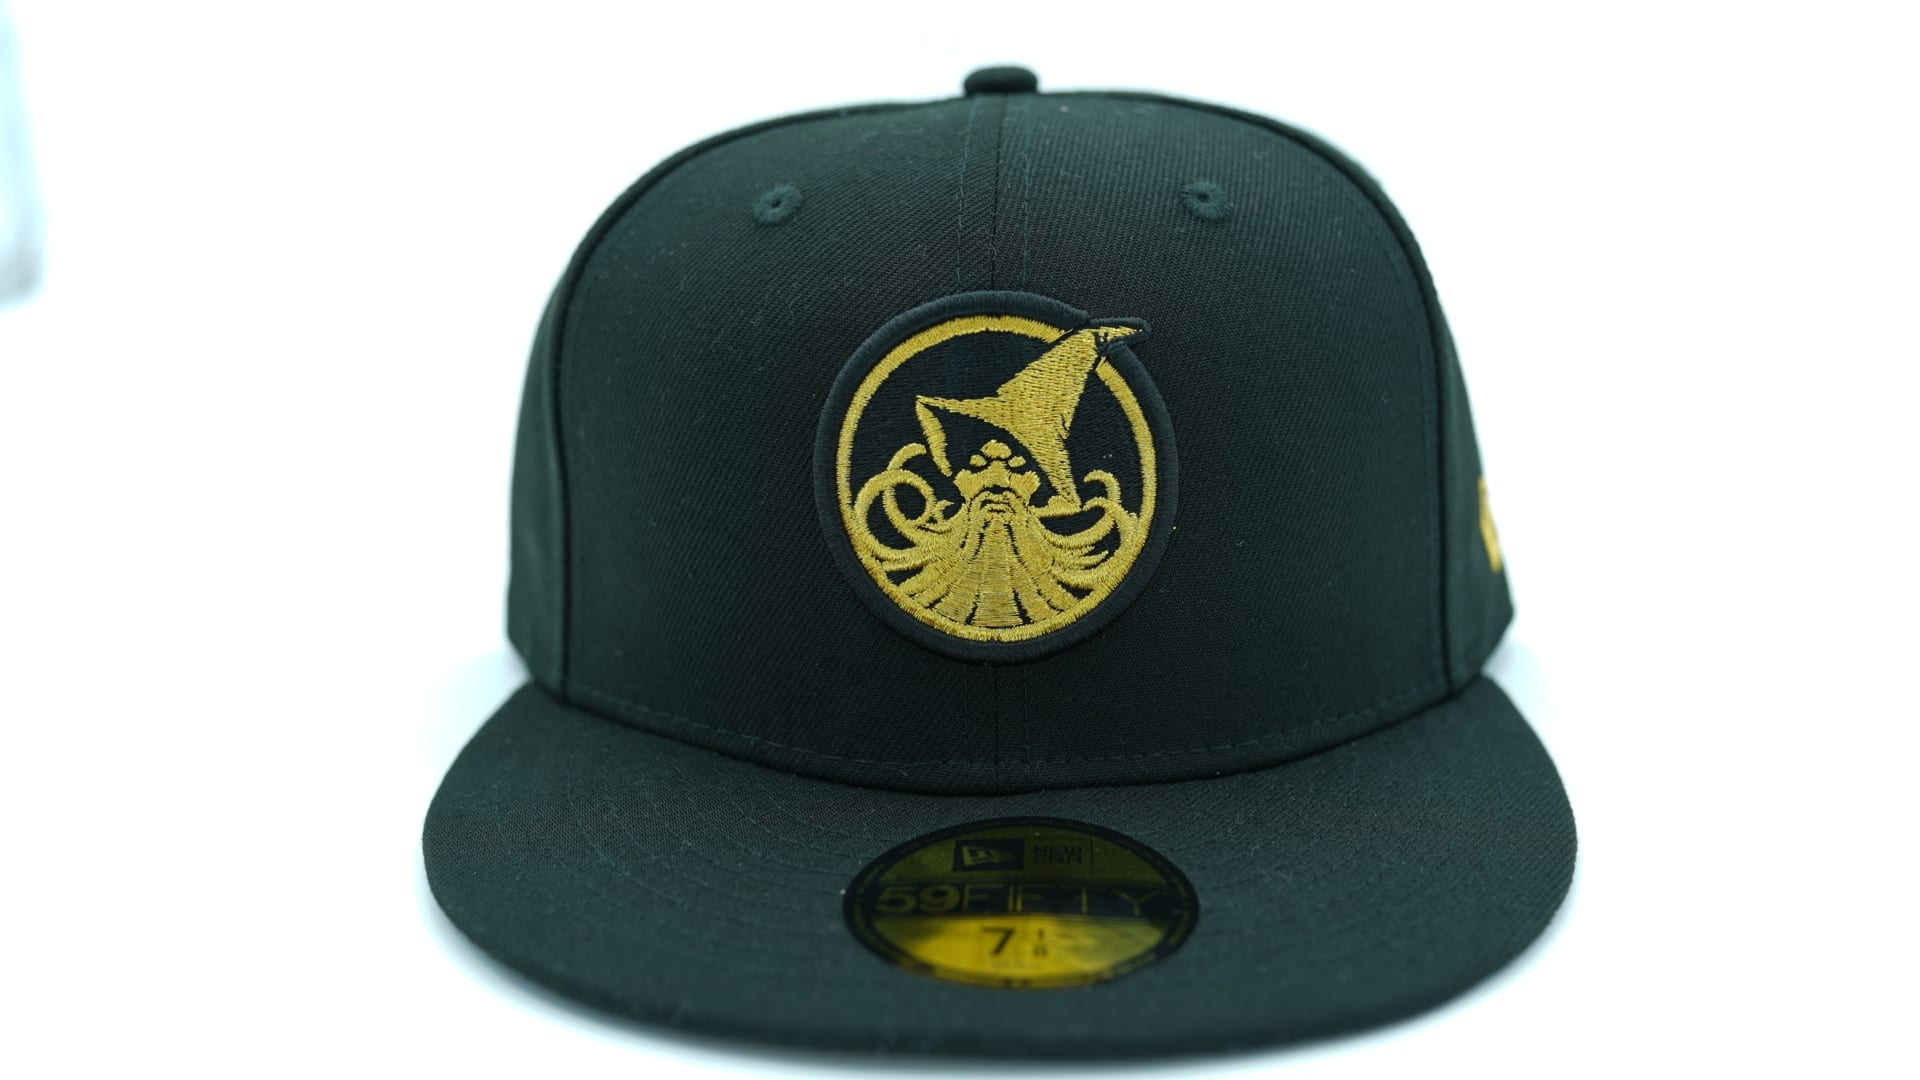 new fitteds hat club custom new era x mlb 59fifty